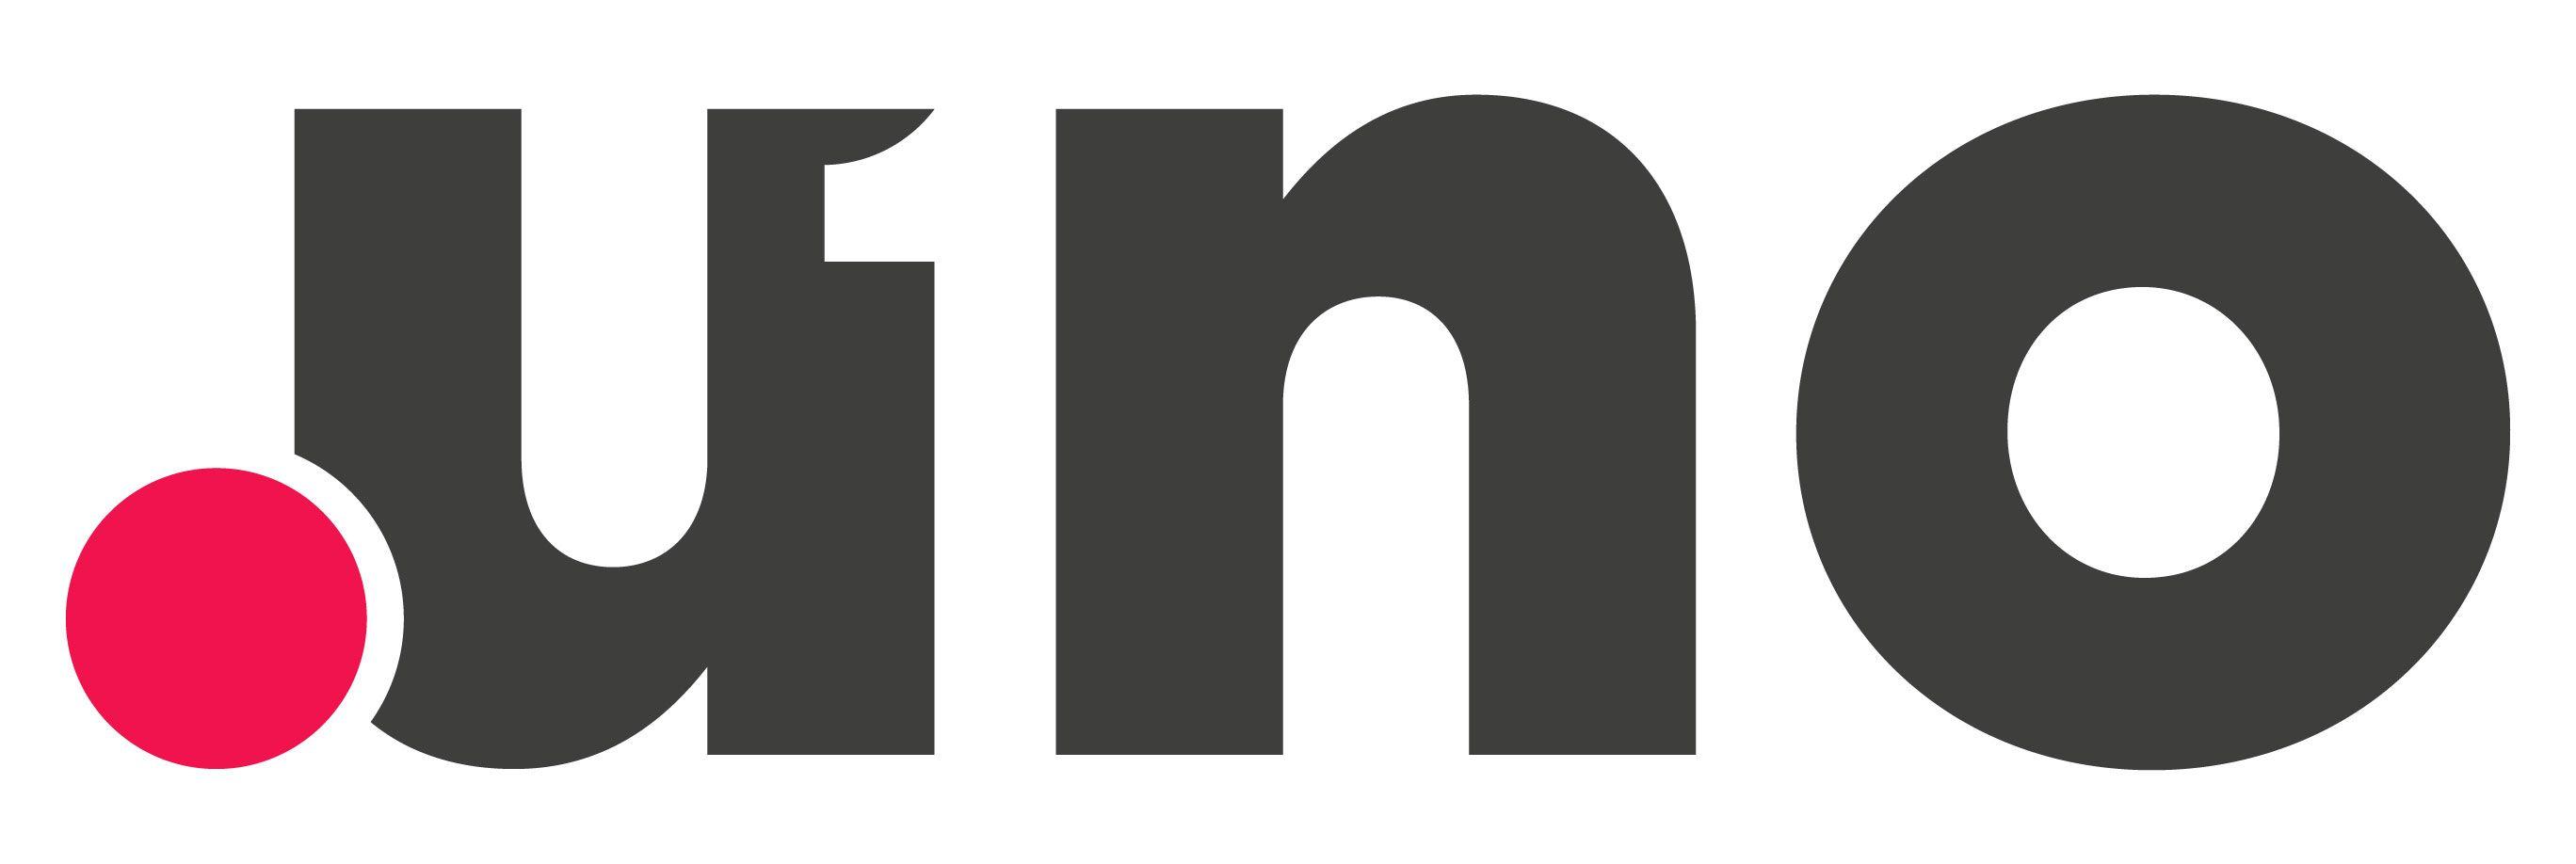 .UNO TLD logo